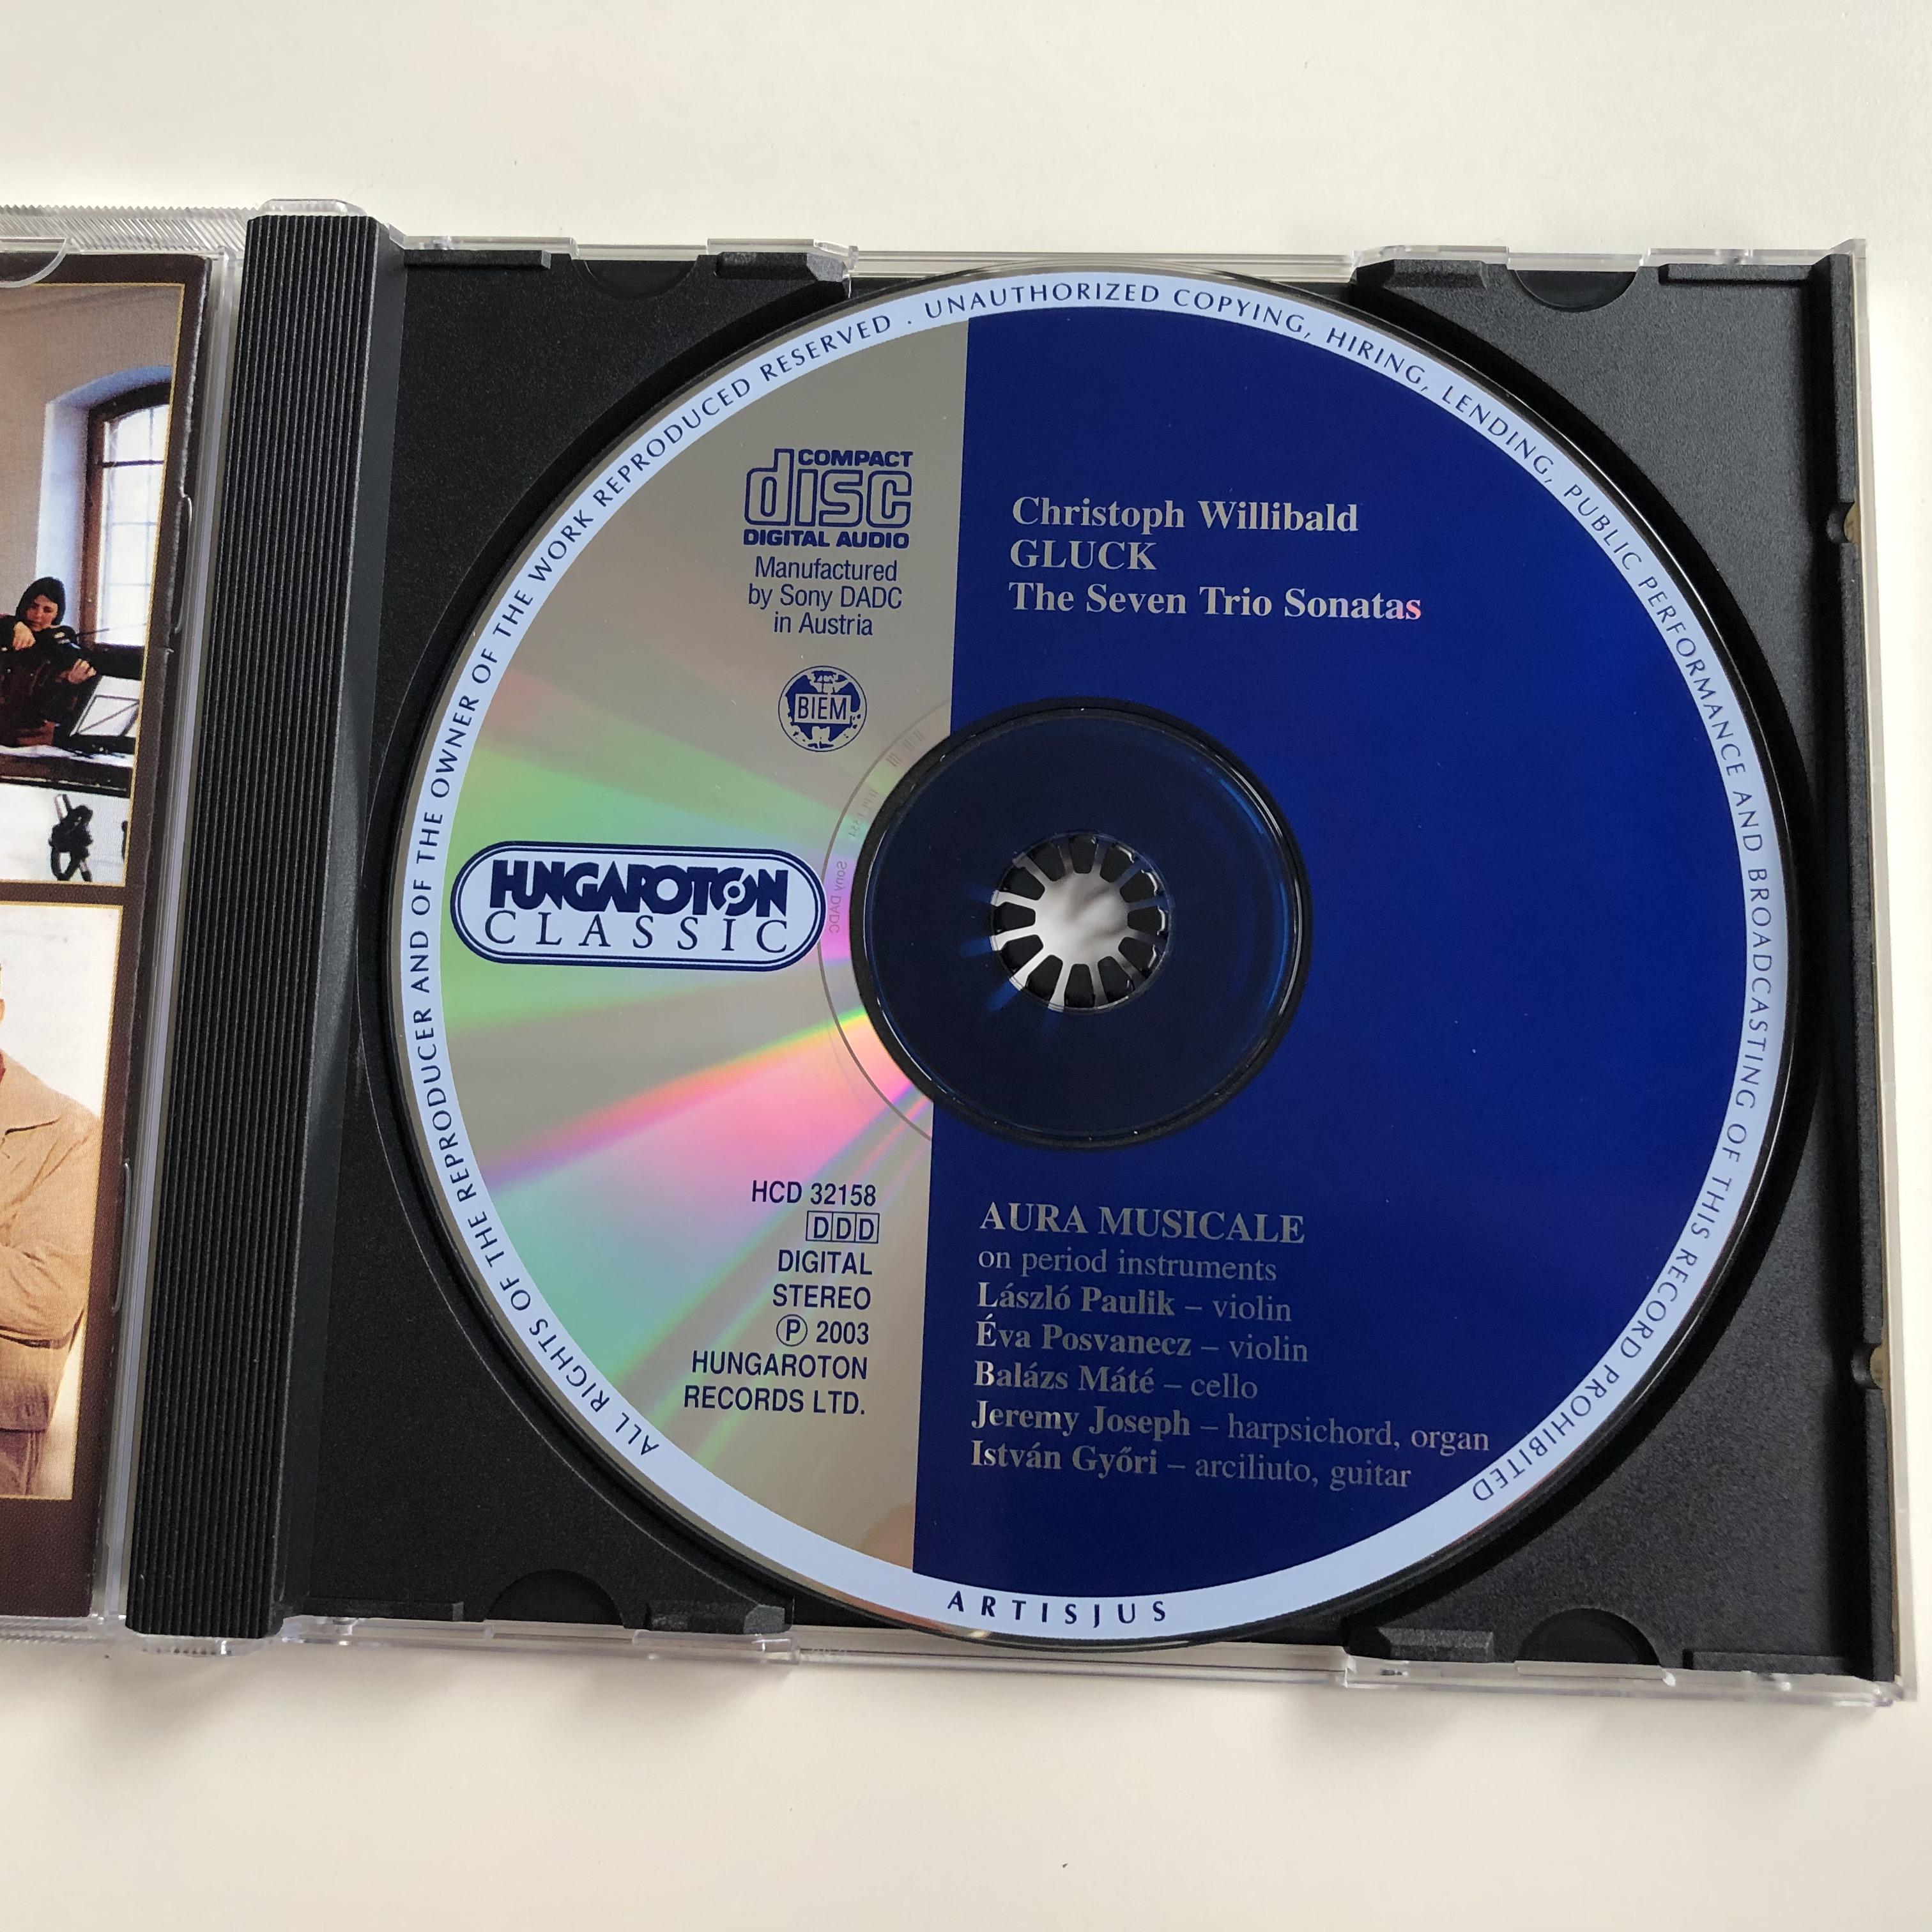 gluck-the-seven-trio-sonatas-aura-musicale-on-period-instruments-artistic-director-balazs-mate-hungaroton-classic-audio-cd-2003-stereo-hcd-32158-6-.jpg